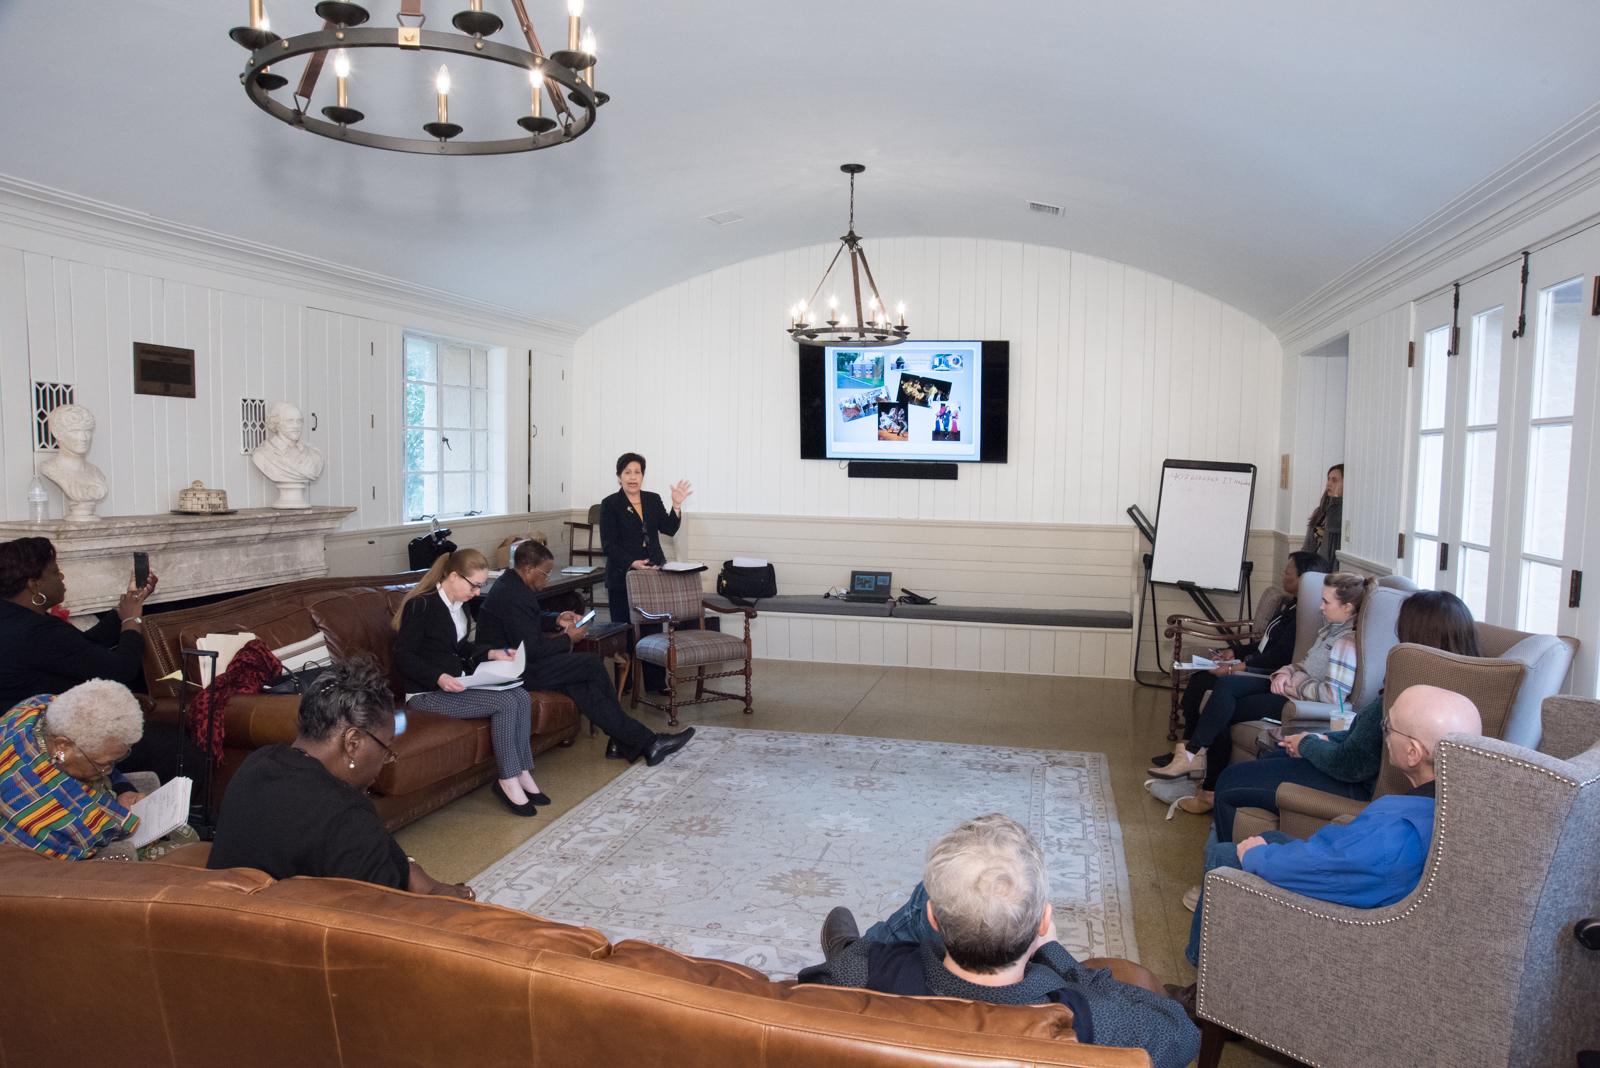 Communities-Conference-2018-01-25-5690.jpg